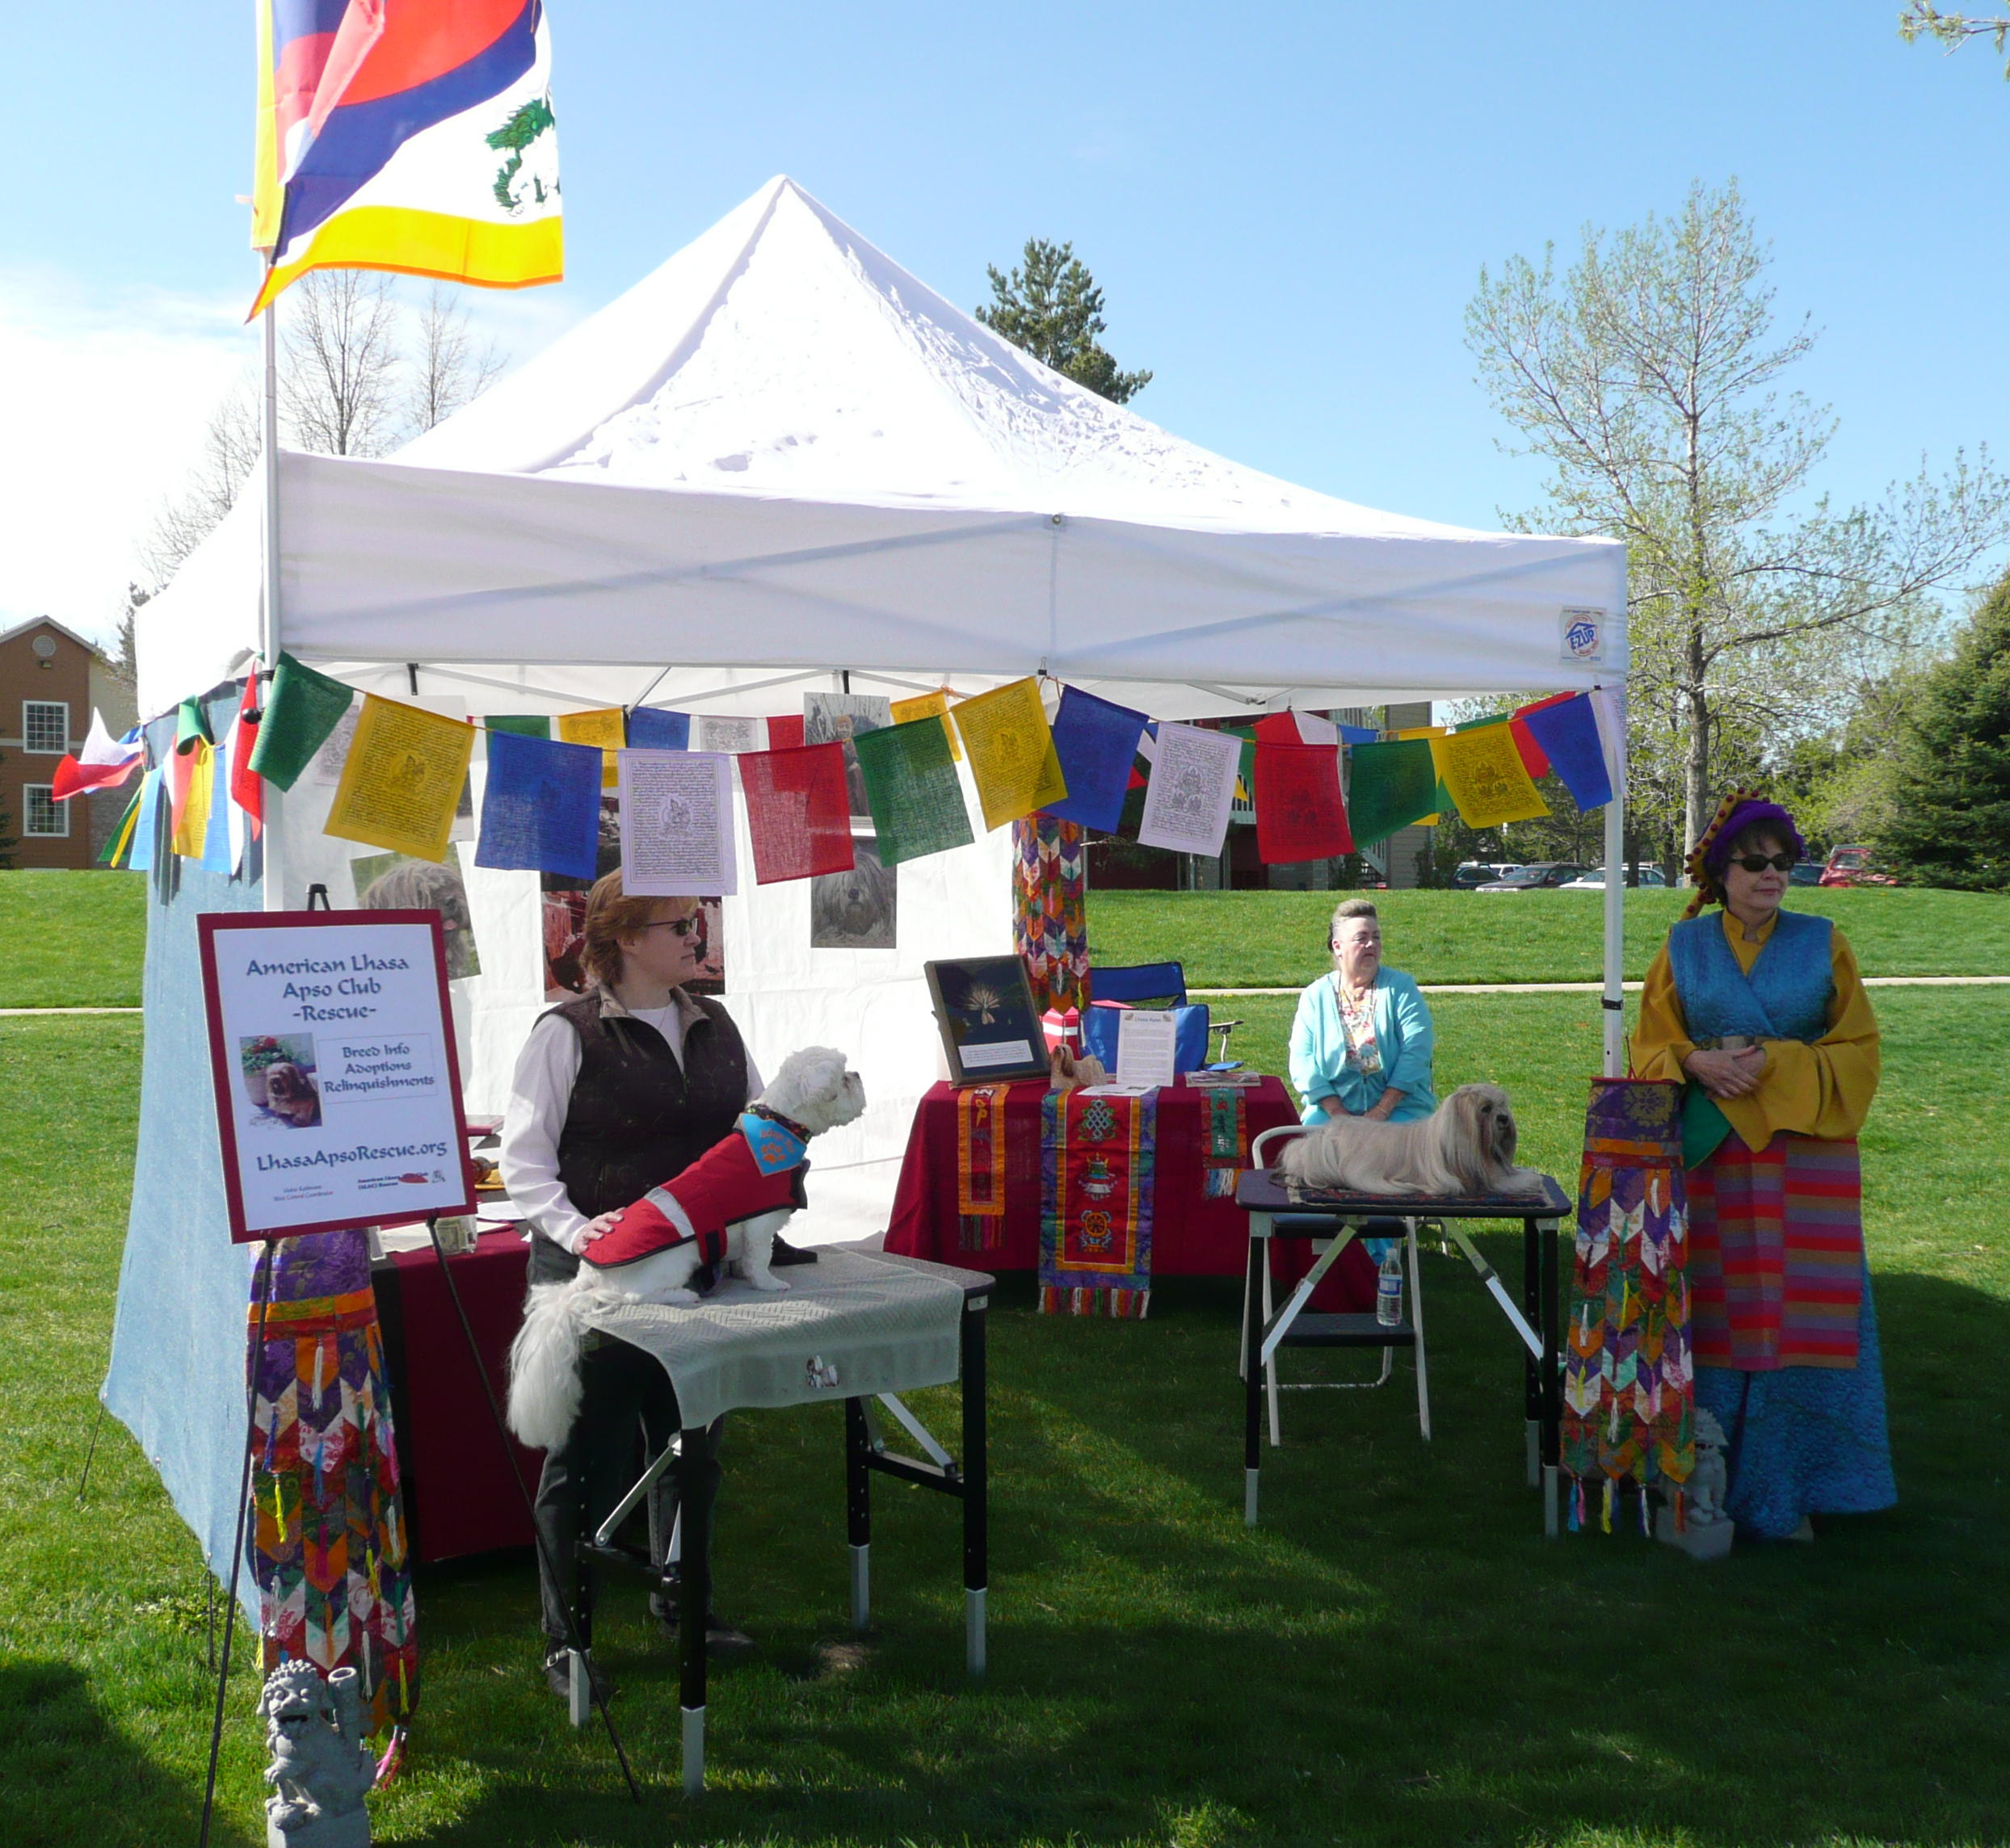 Susan, right, in traditional Tibetan garb